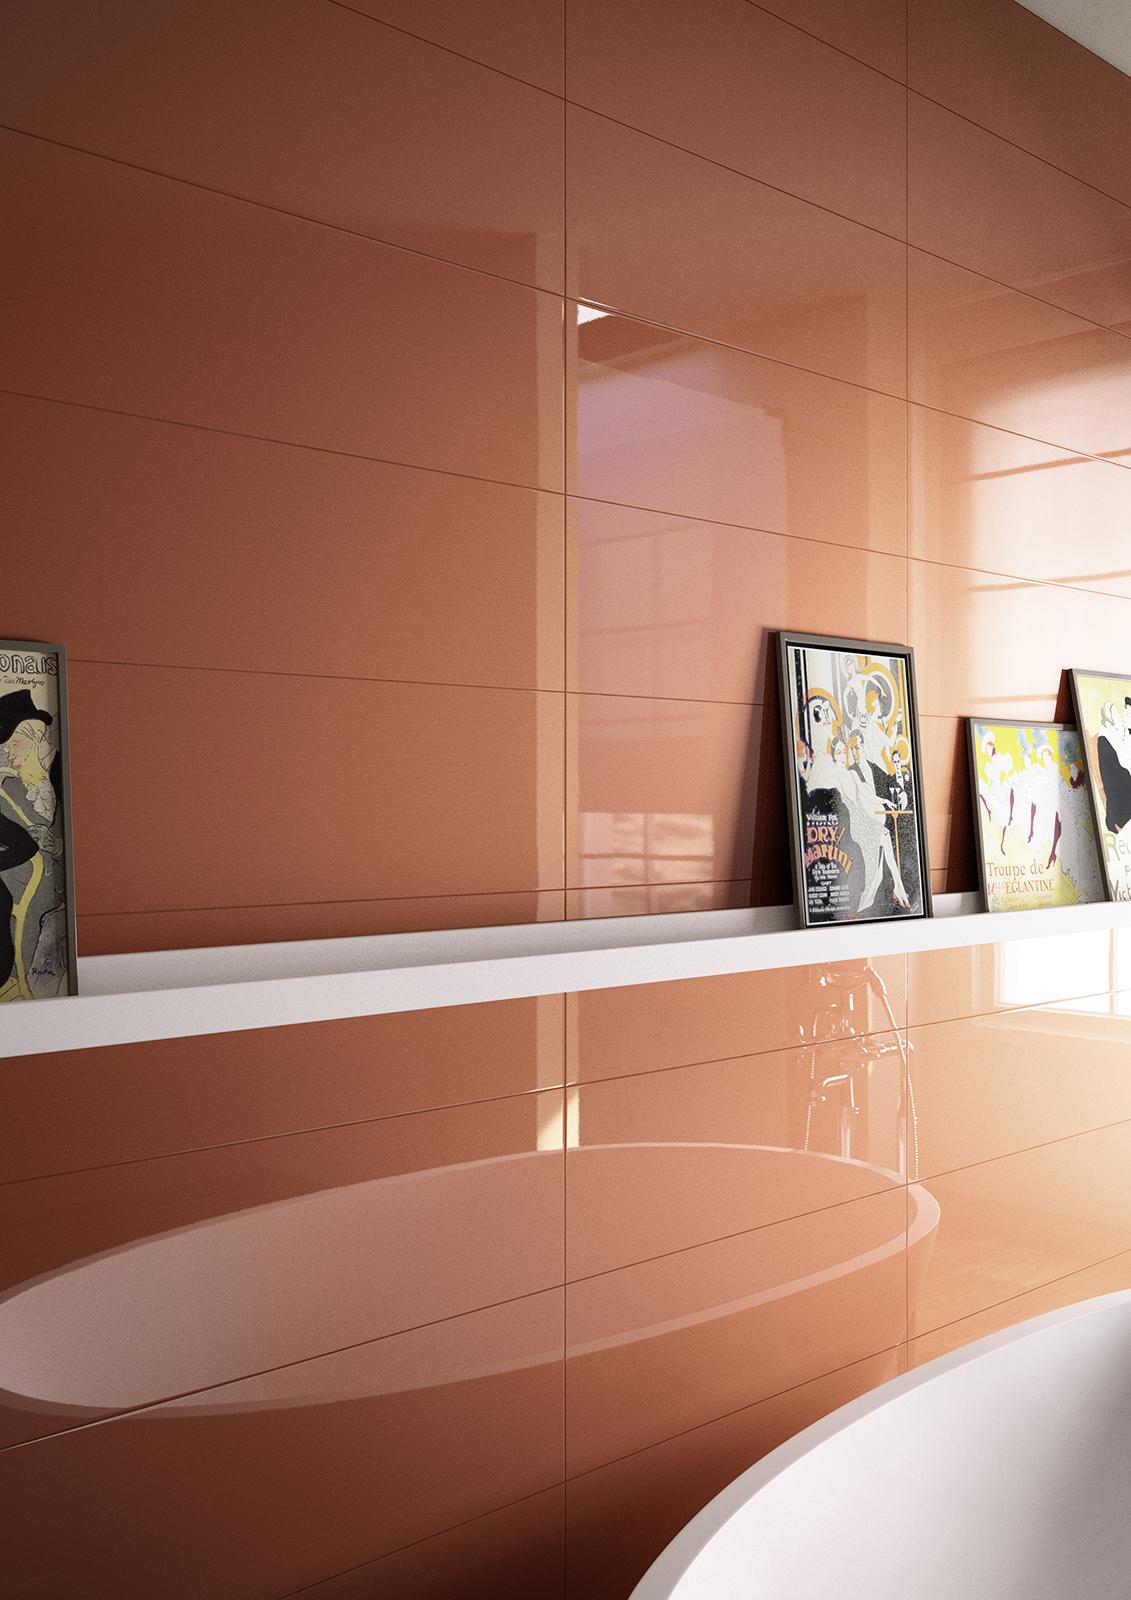 Colourline polished porcelain bathroom wall tiling marazzi colourline ceramic tiles marazzi4851 doublecrazyfo Choice Image